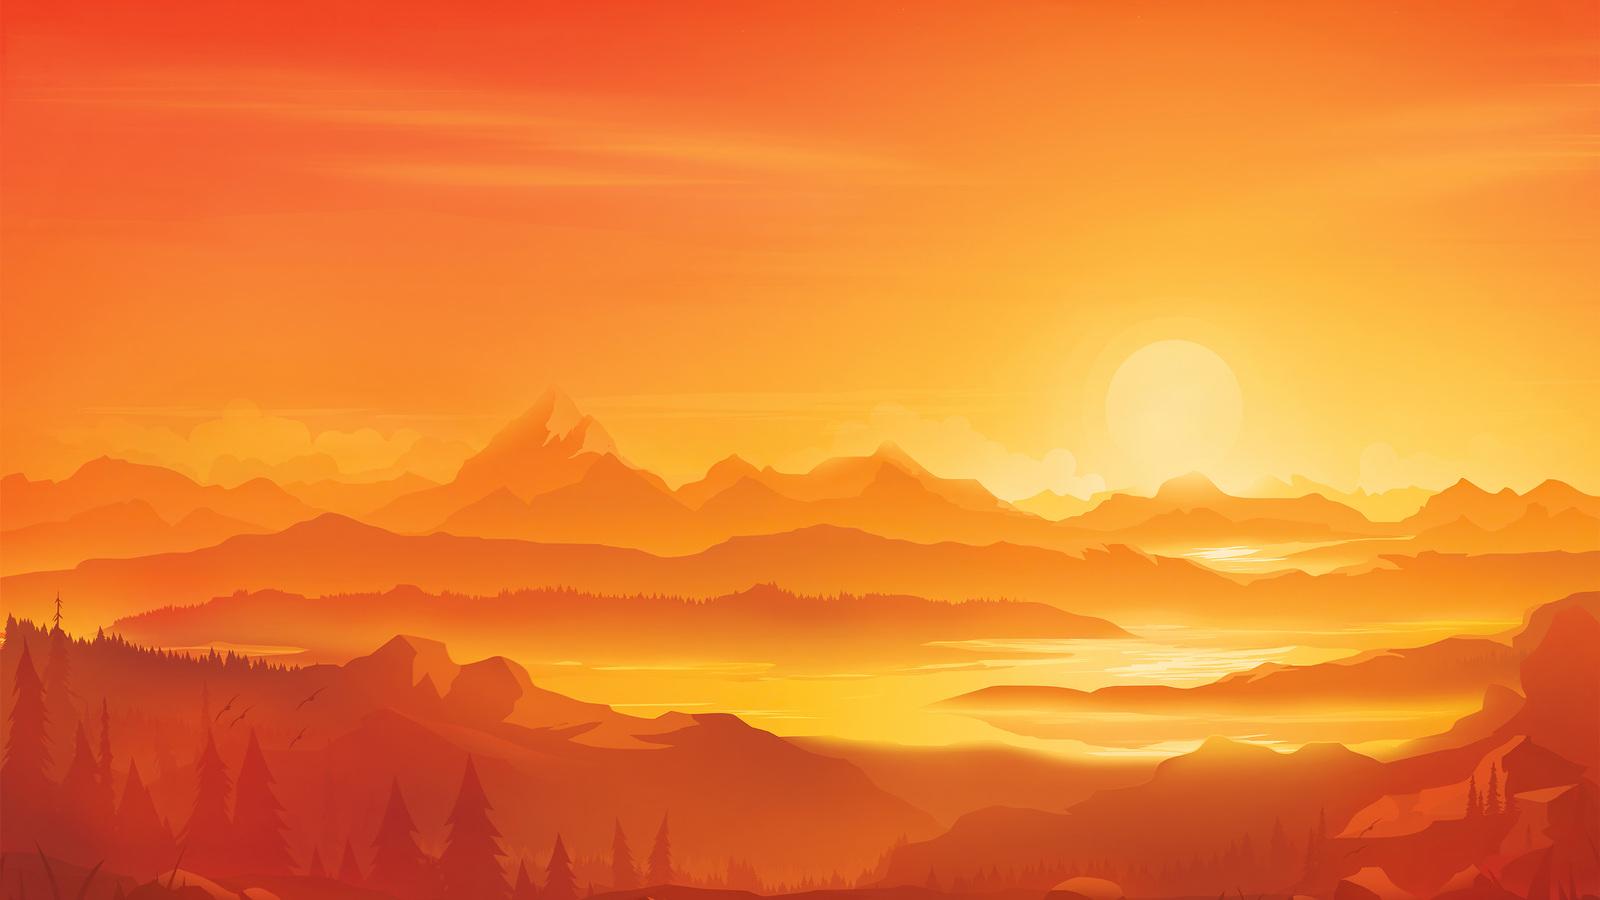 orange-landscape-morning-minimal-5k-mi.jpg